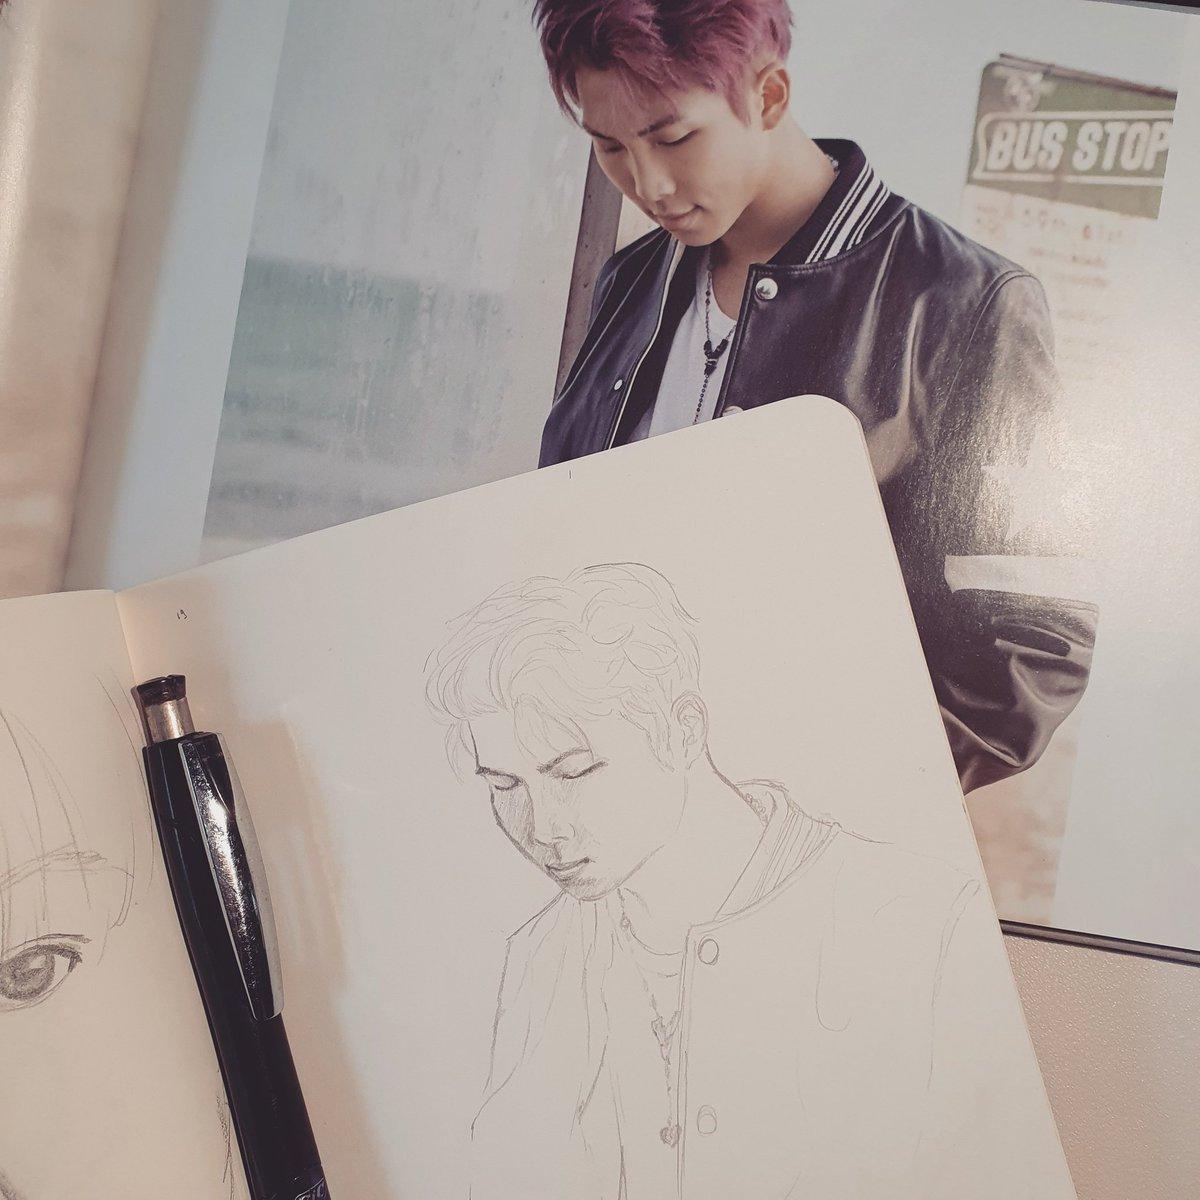 What it looks like when I actually take the time to sketch properly 😅  #namjoon #kimnamjoon #rm #btsrm #sketch #sketchbook #drawing #art #bangtan #onebangtanaday #baguettesarmysxart #youneverwalkalone #ynwa